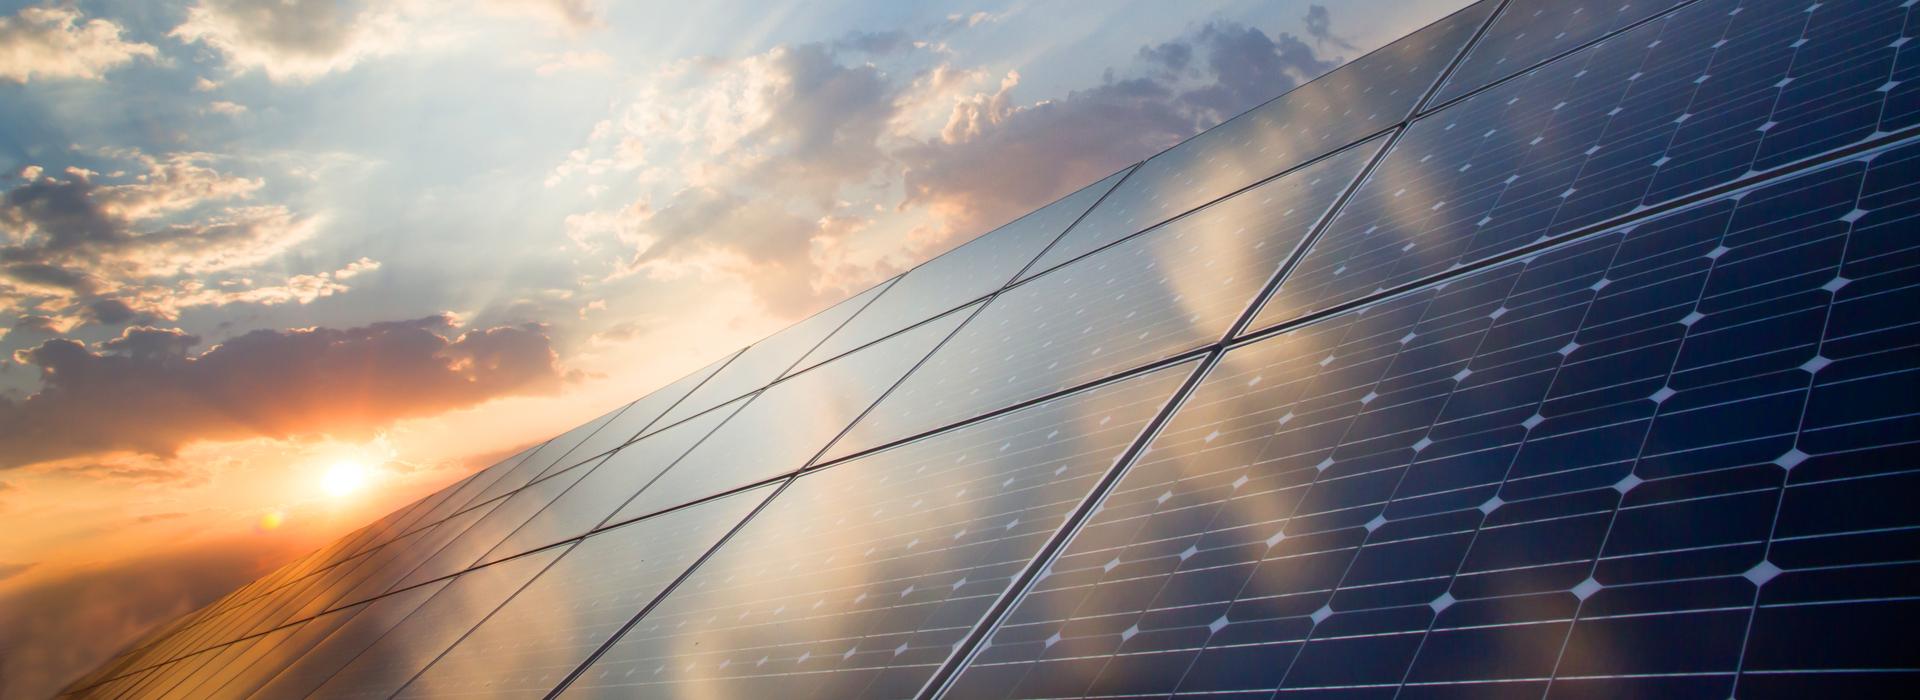 Solarpanels im Sonnenuntergang